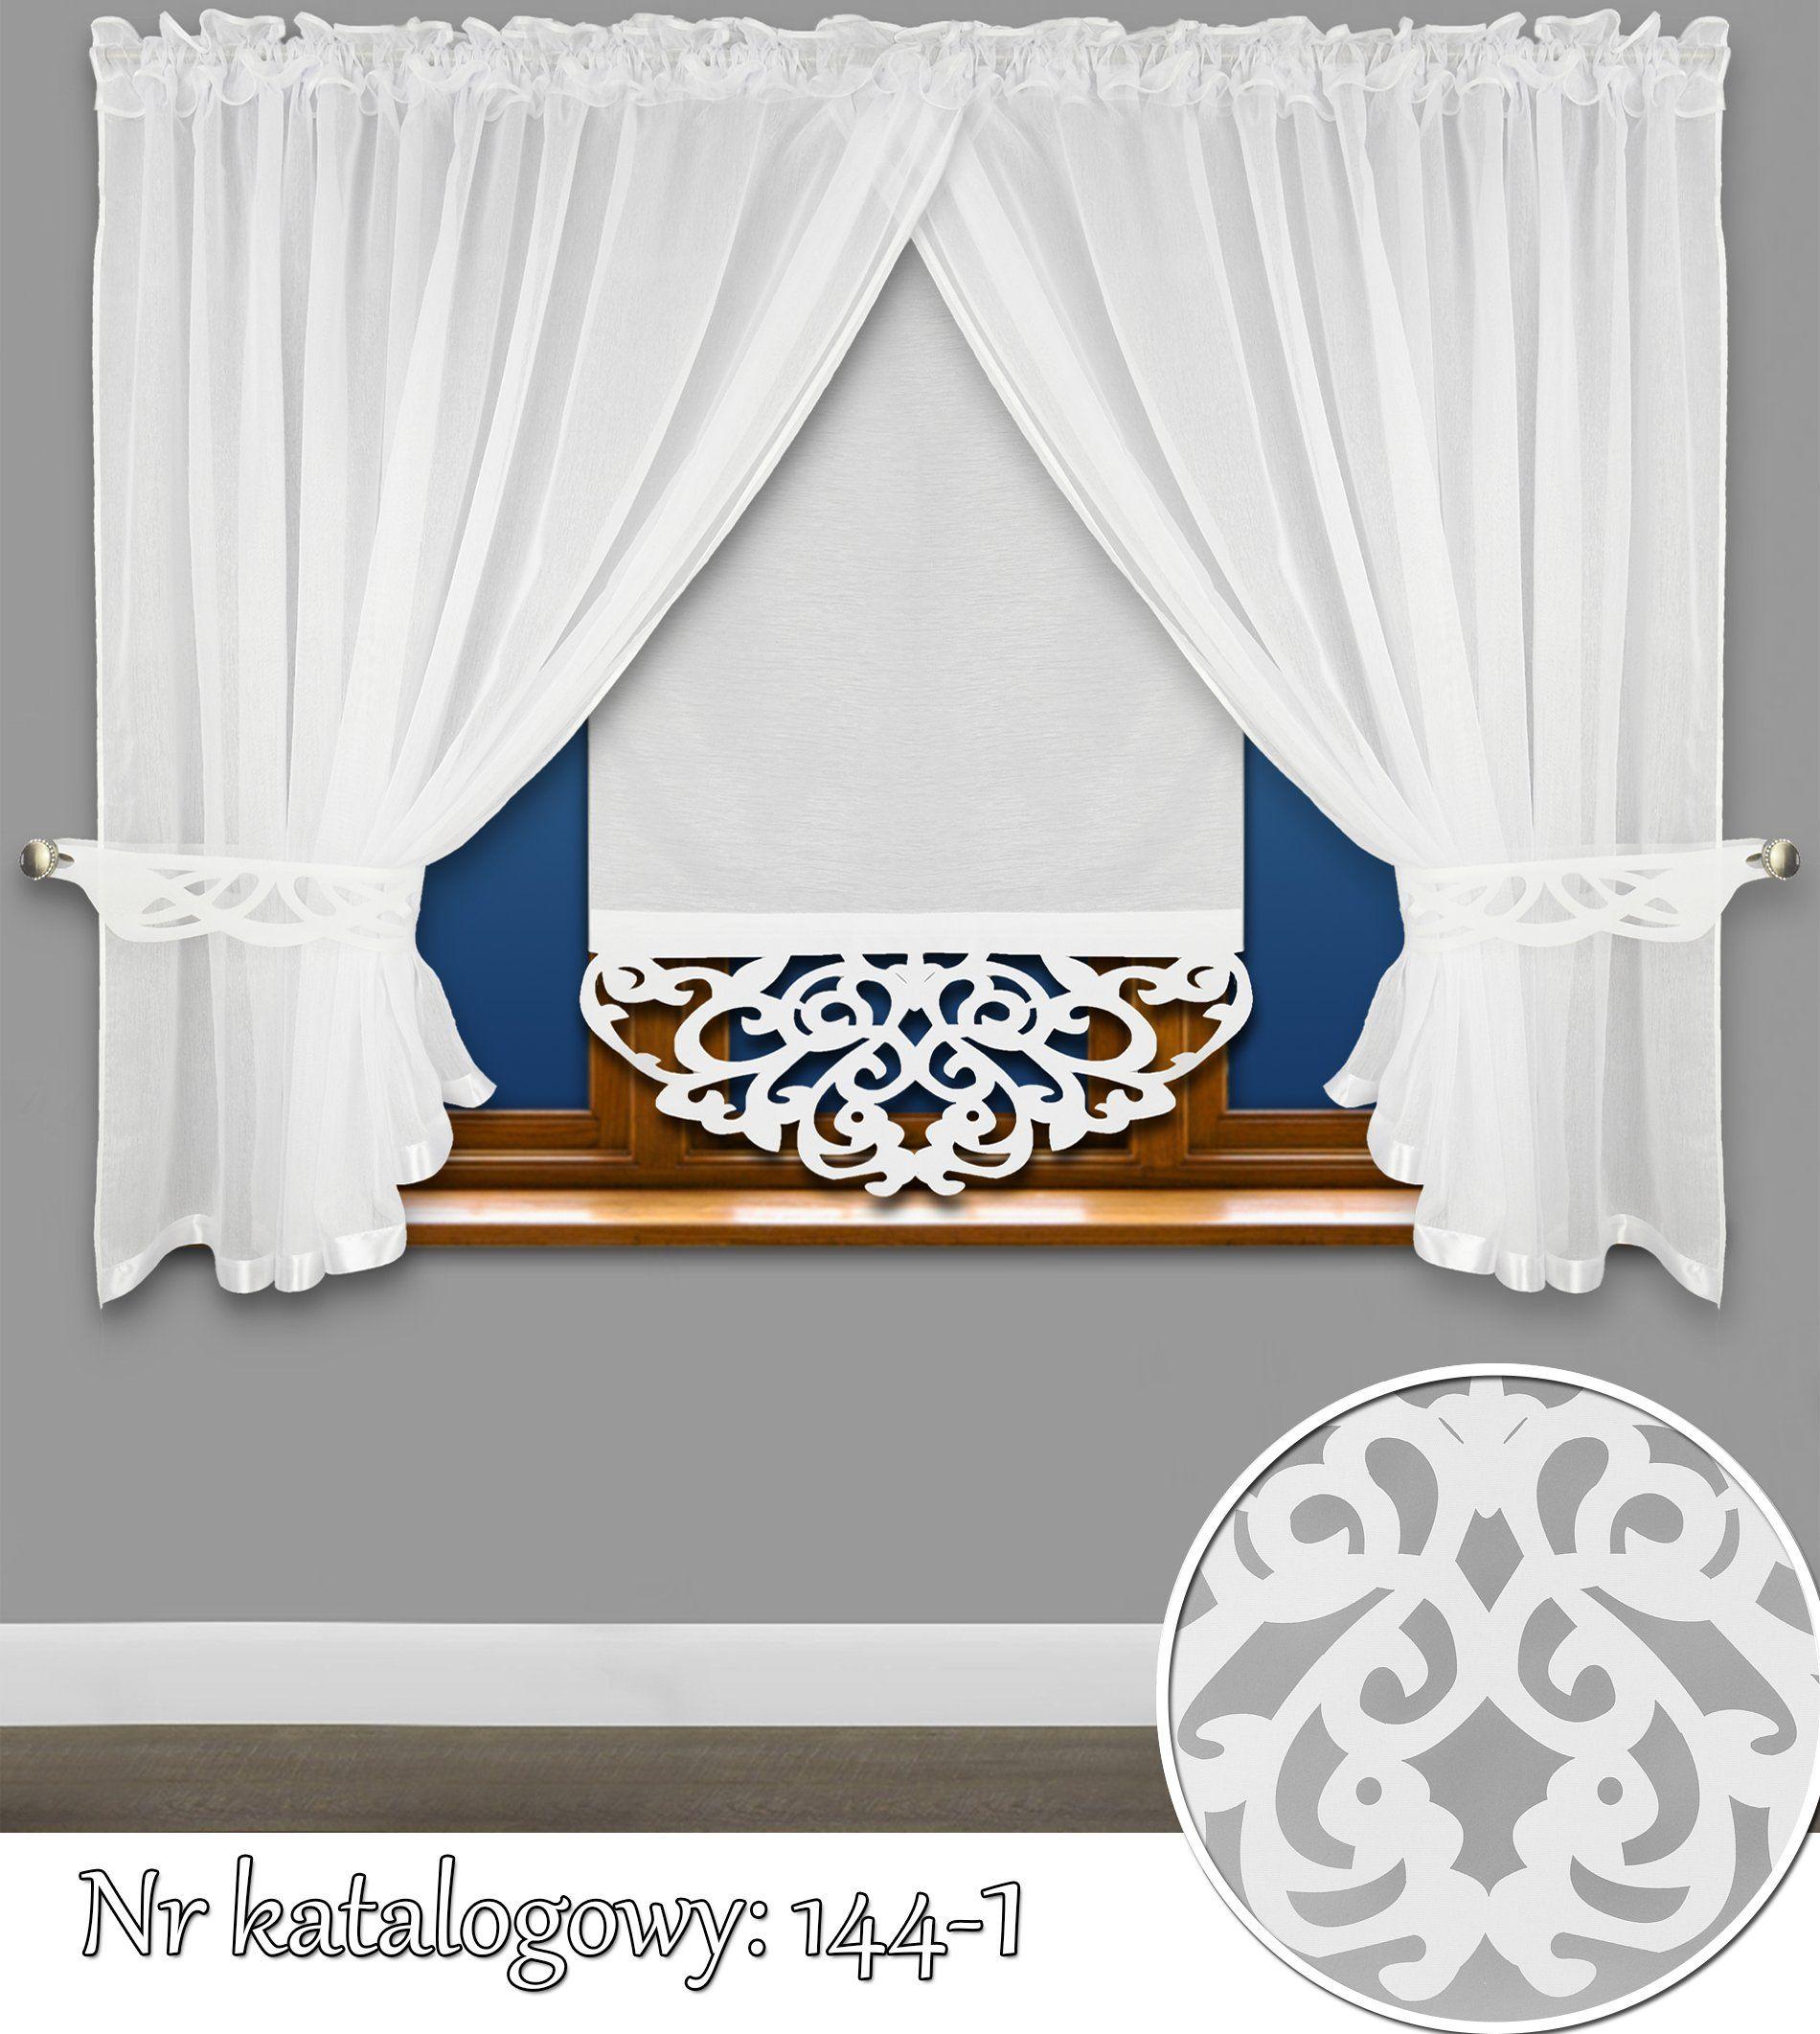 Zestaw Firan Azur Panel Sable Komplet Firana Ekran 7417899672 Allegro Pl Wiecej Niz Aukcje Curtain Decor Decor Home Decor